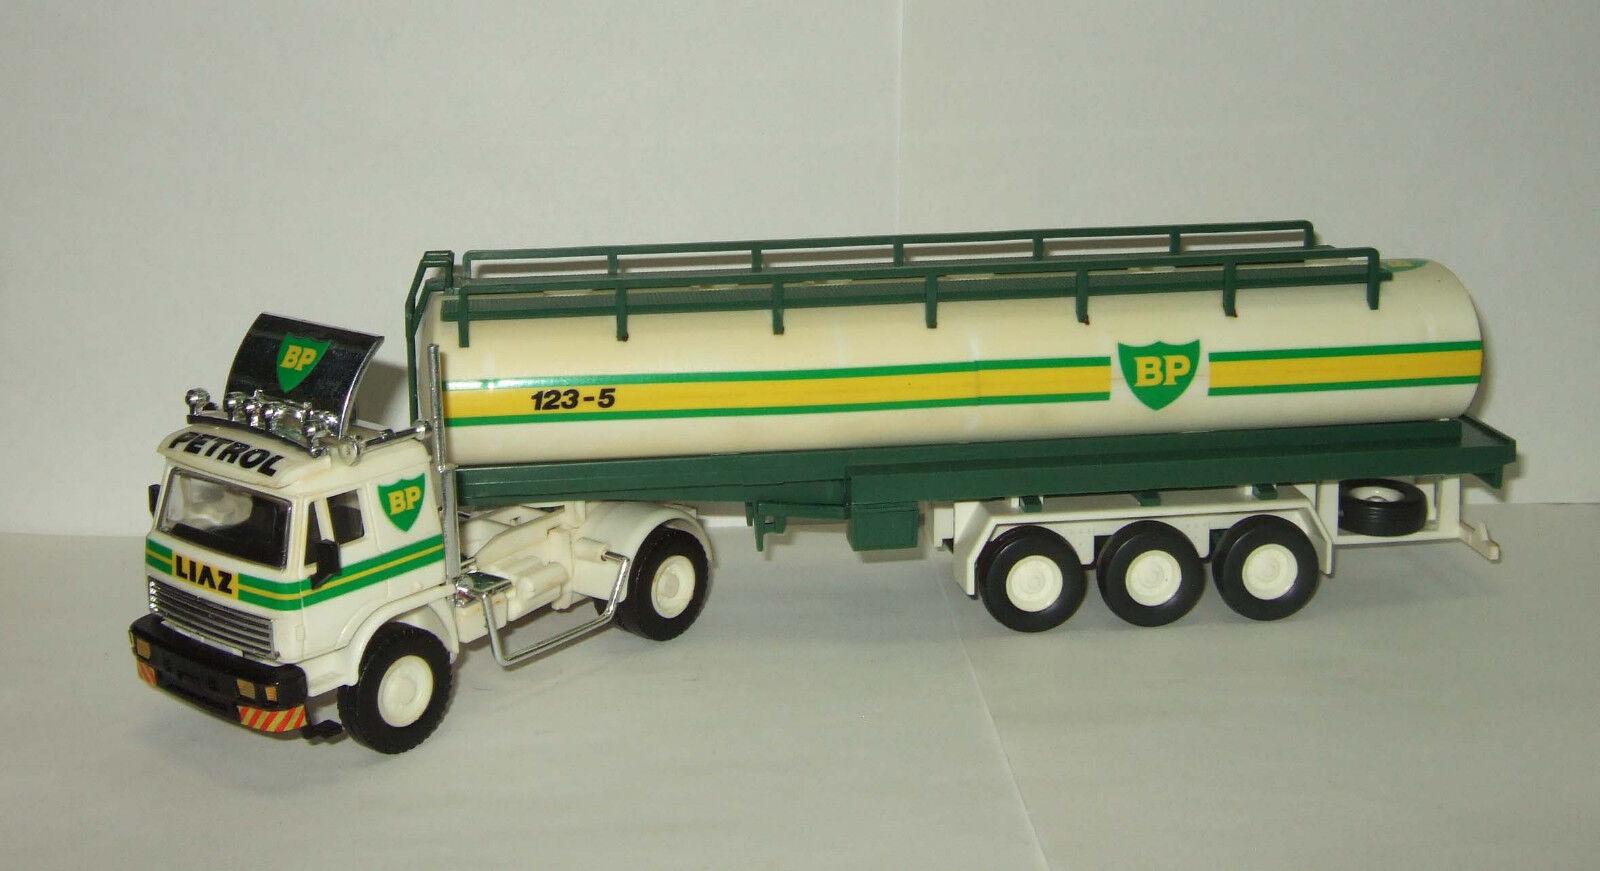 1 48 Monti System Liaz 110 551 + semitrailer Cintern BP 1983 soviet czech truck